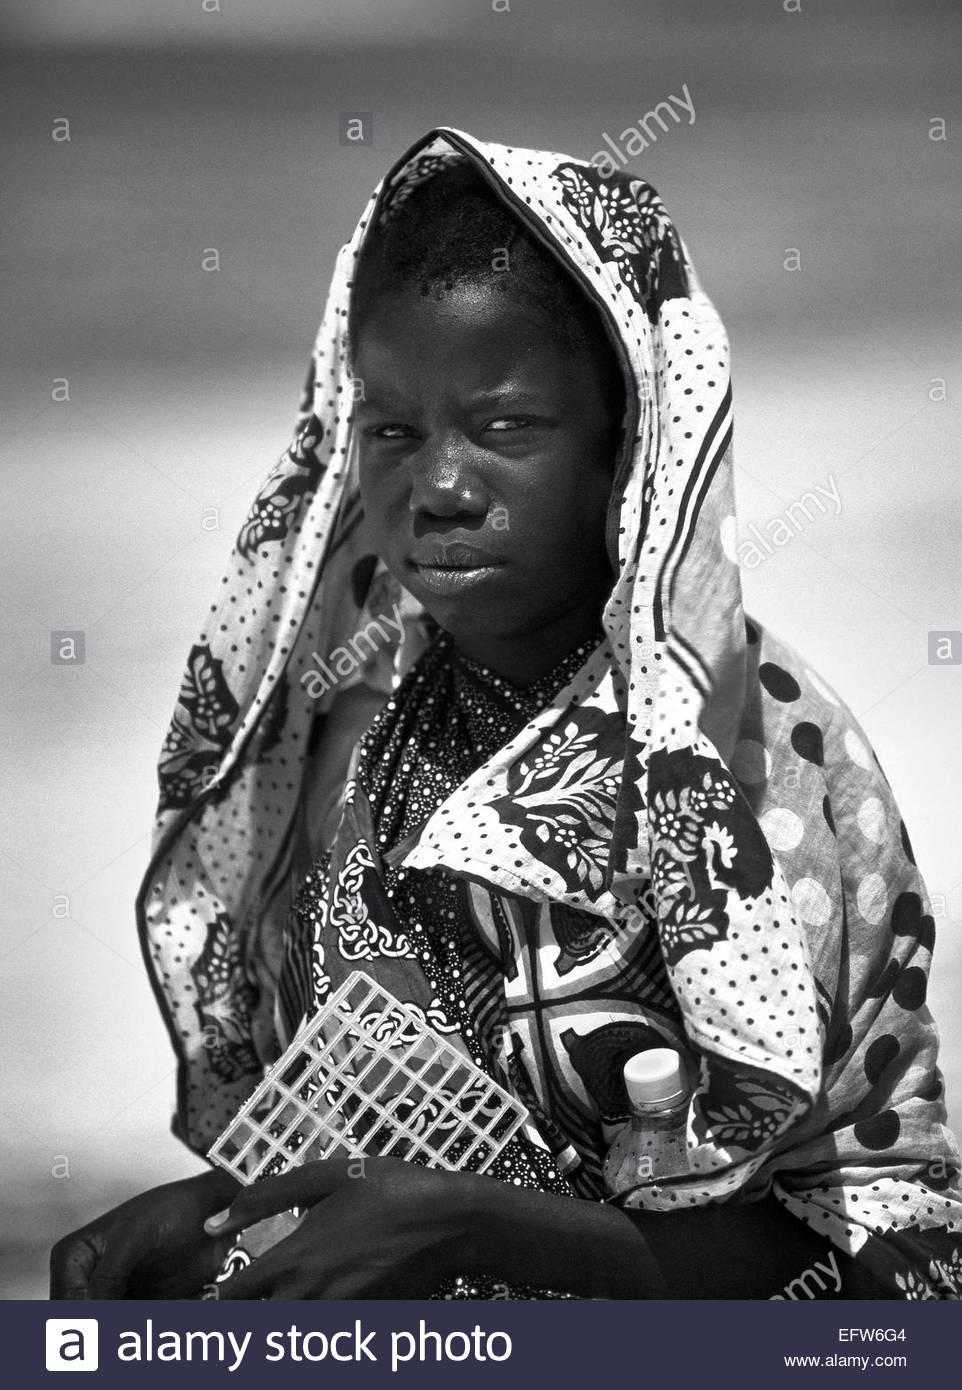 Kenya - Republic of Kenya Africa 2000 Mombasa Beach People Person Child Kids Children Head And Shoulders Headshot Stock Photo